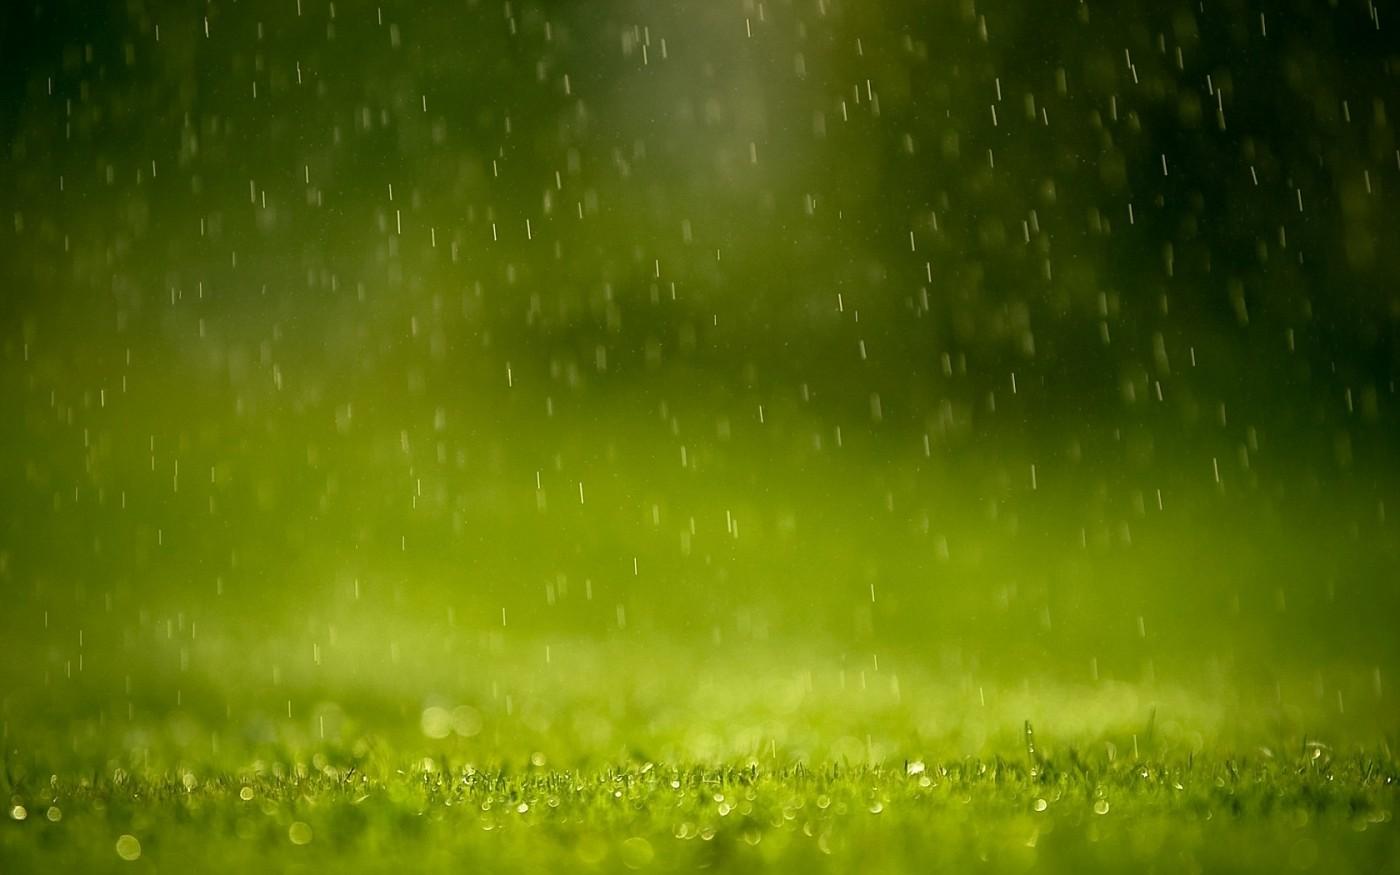 Photo: 3d-abstract-lovely-high-quality-widescreen-3d-grass-hd